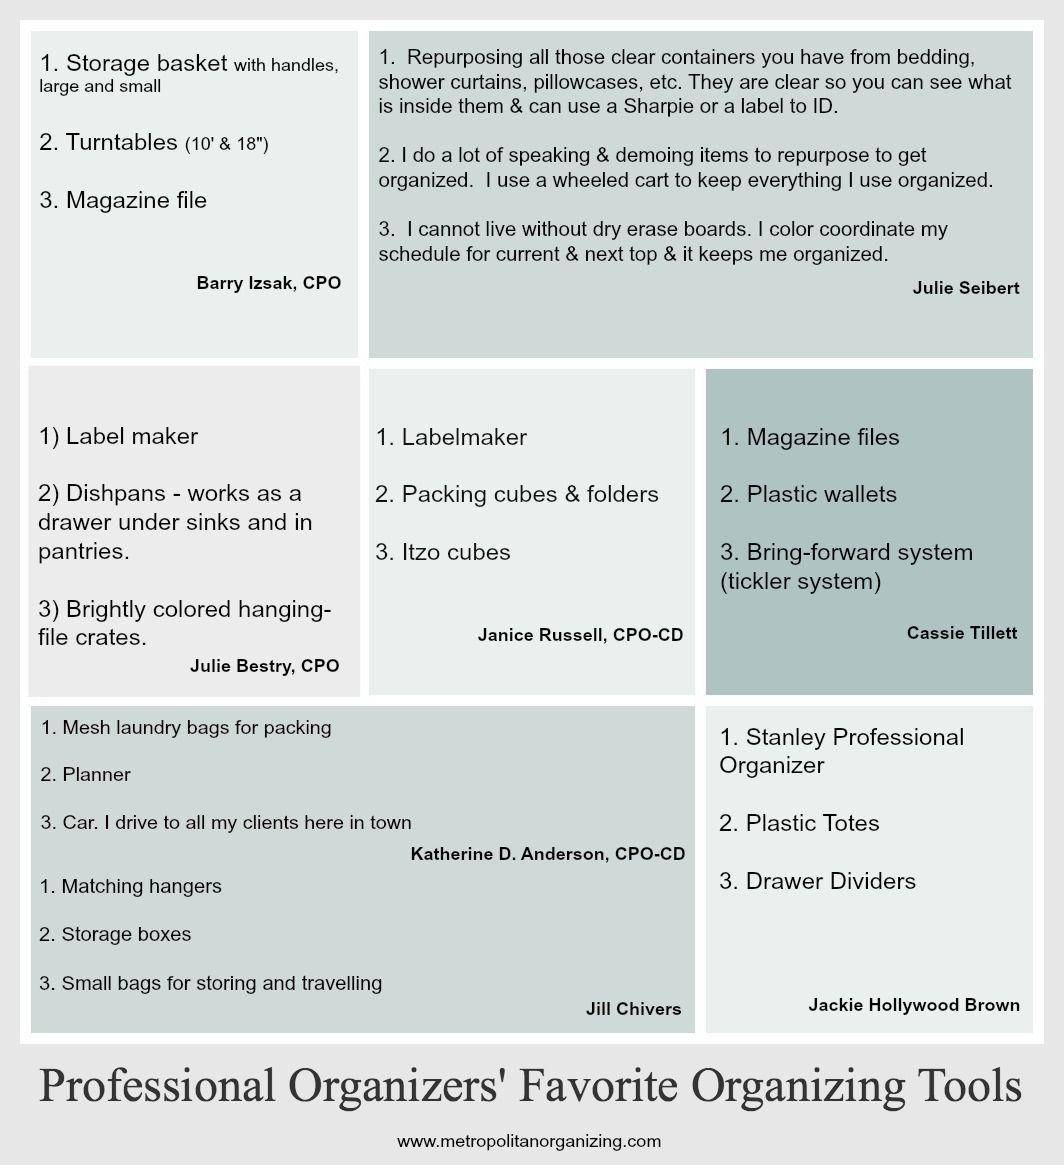 Professional Organizers Favorite Organizing Tools